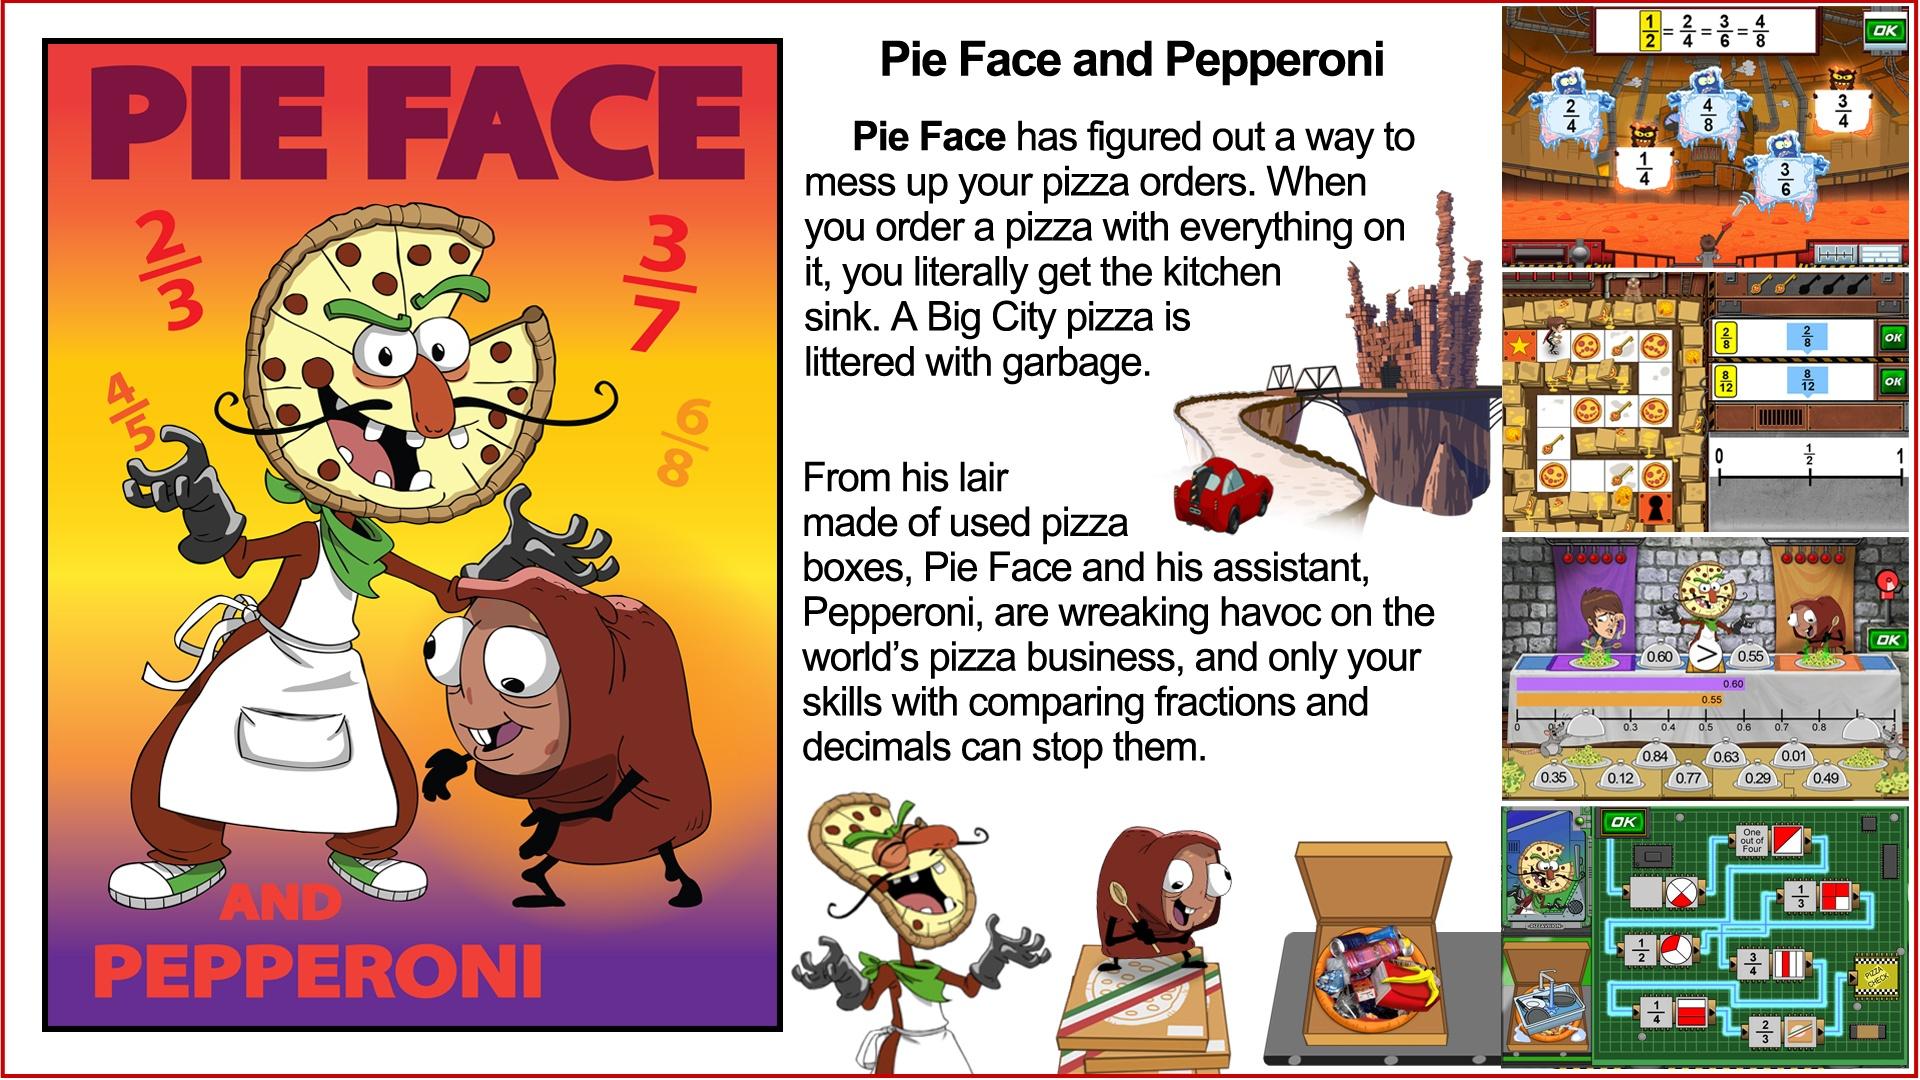 06_Pie_Face.jpg